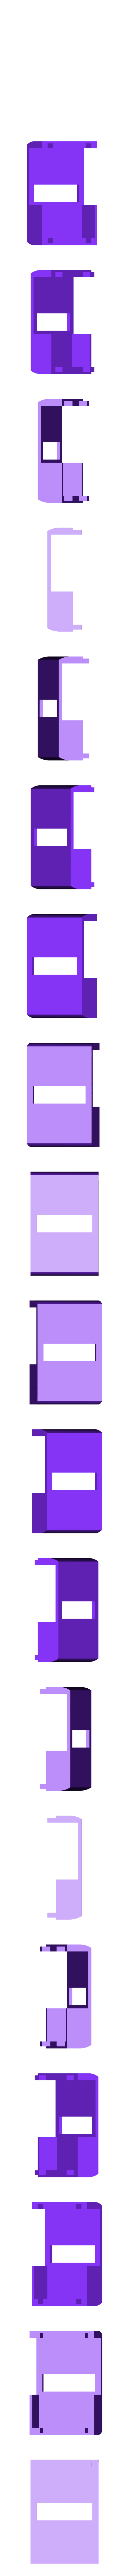 "Slide_Top.stl Download free STL file ""Pencil"" Puzzler • 3D printing design, gzumwalt"